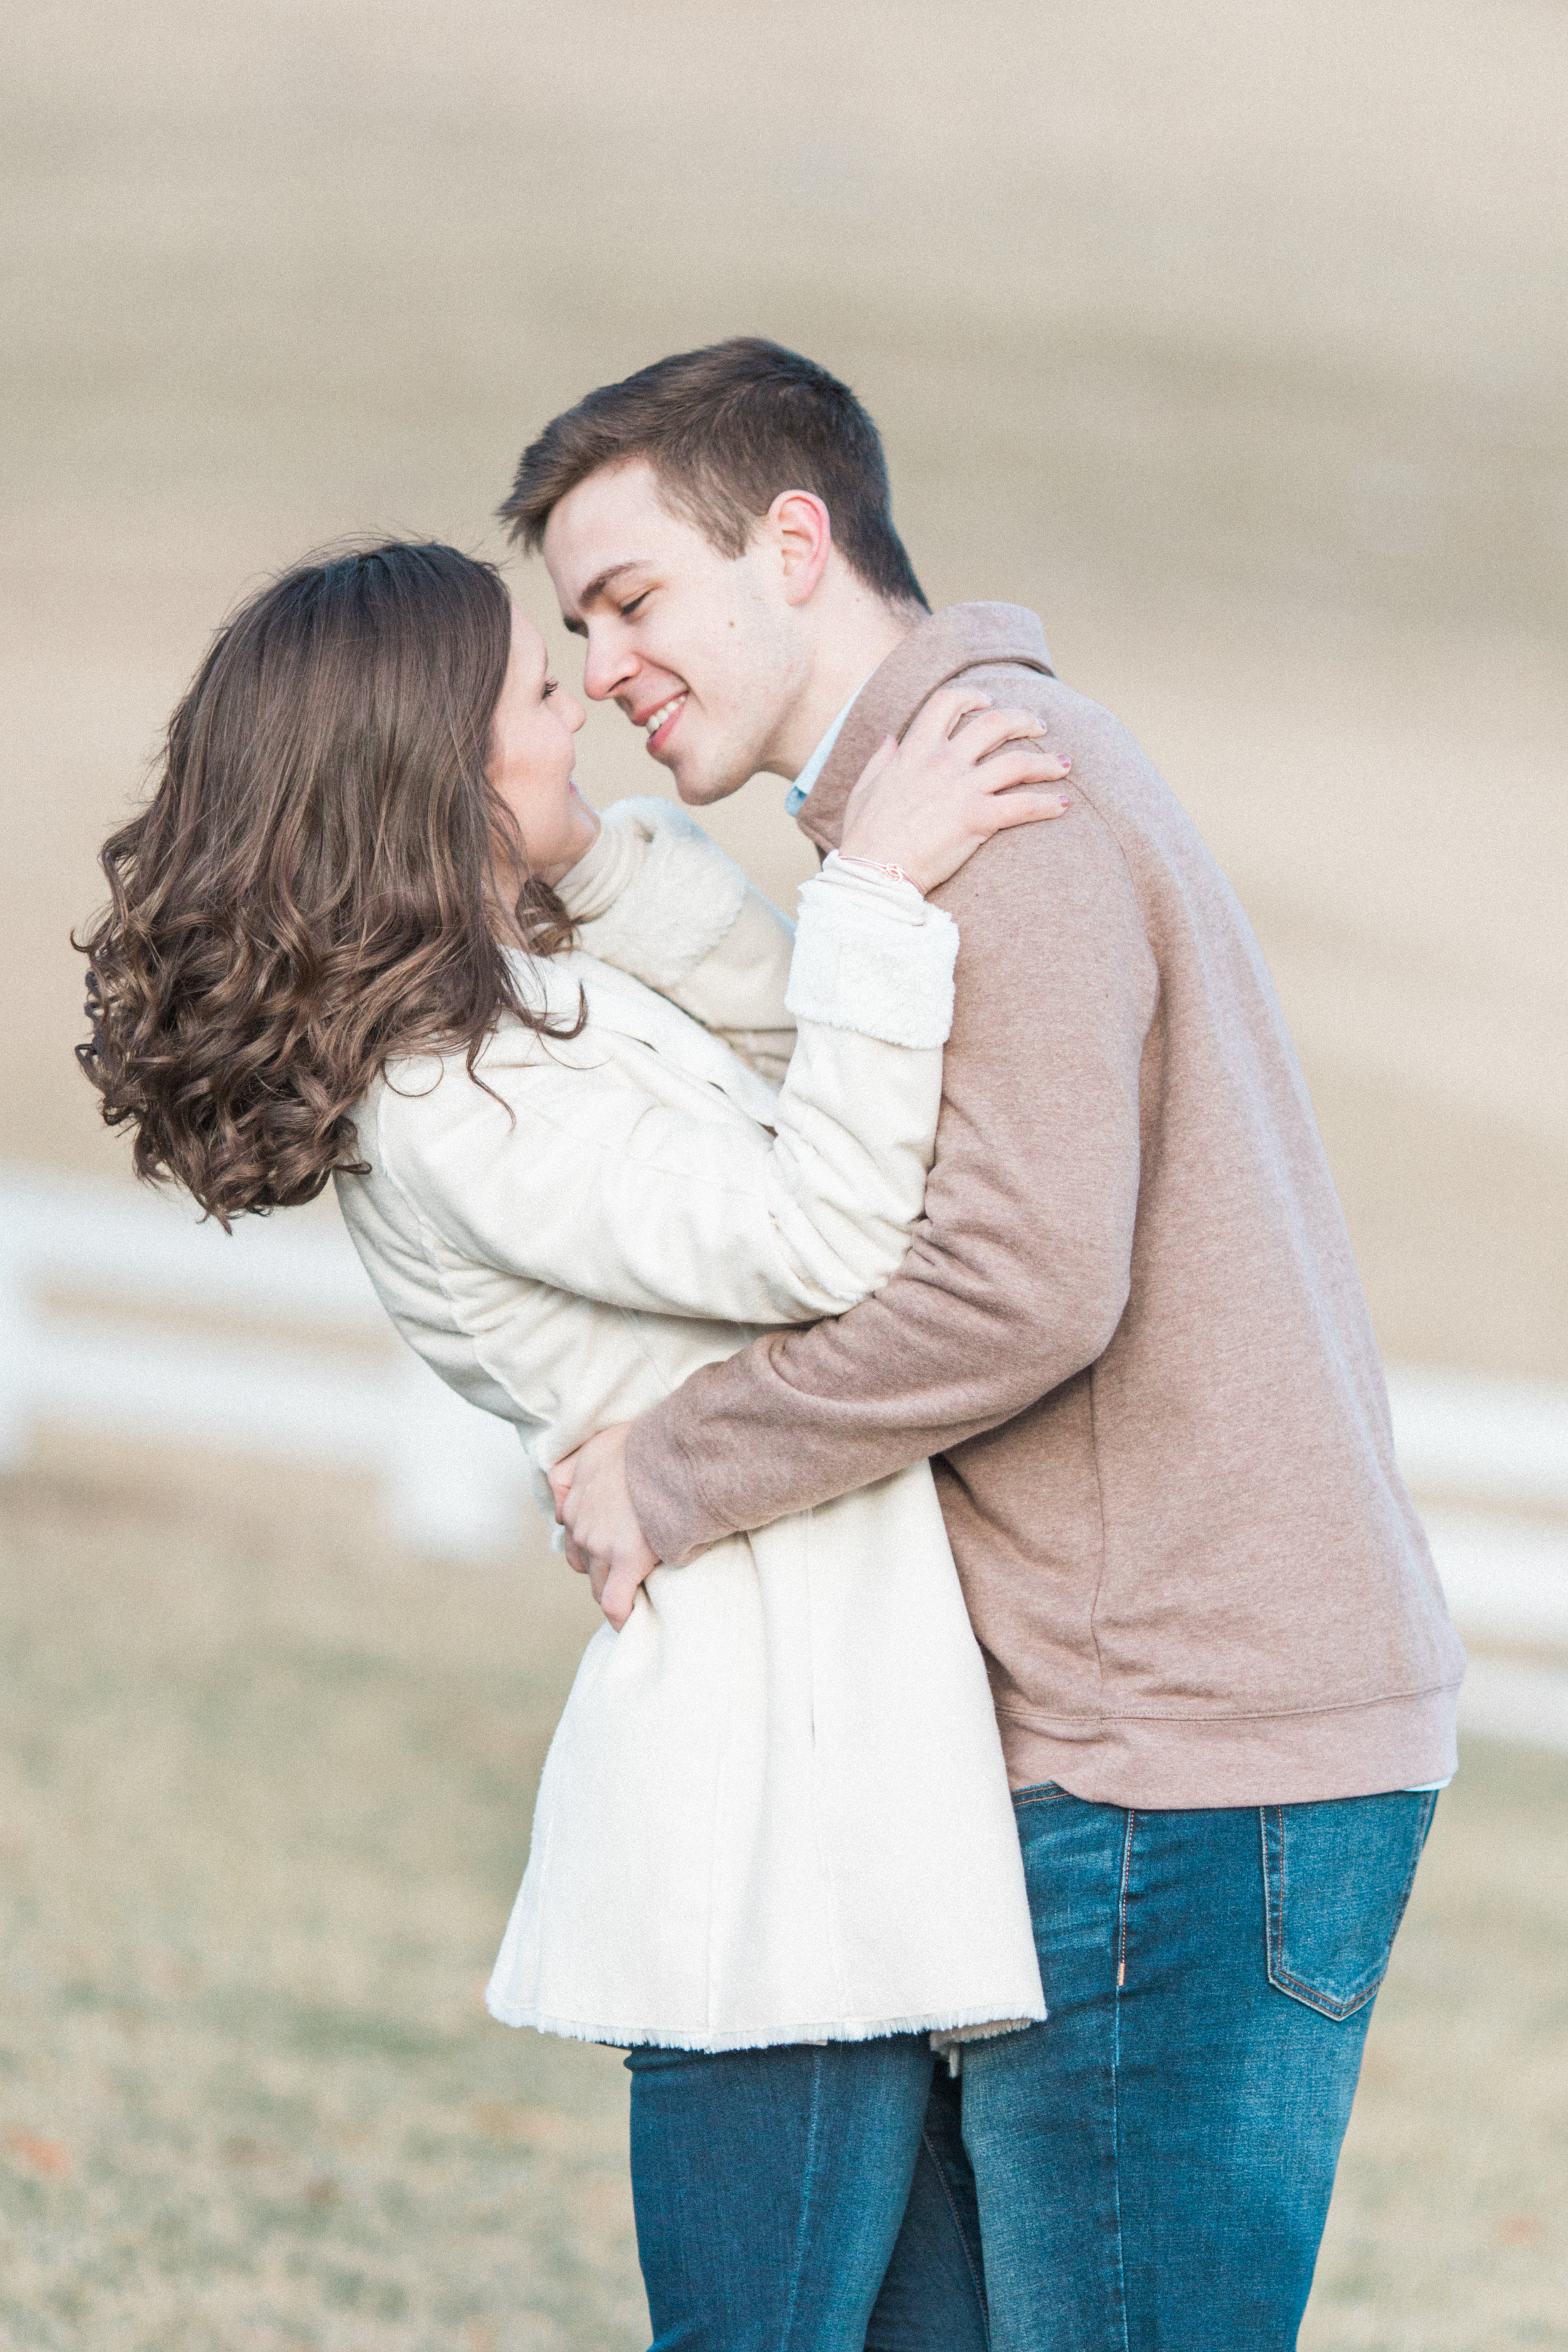 Abigail_Jill_Photography_Maryland_Engagement_Farm_Emily_Justin294.jpg